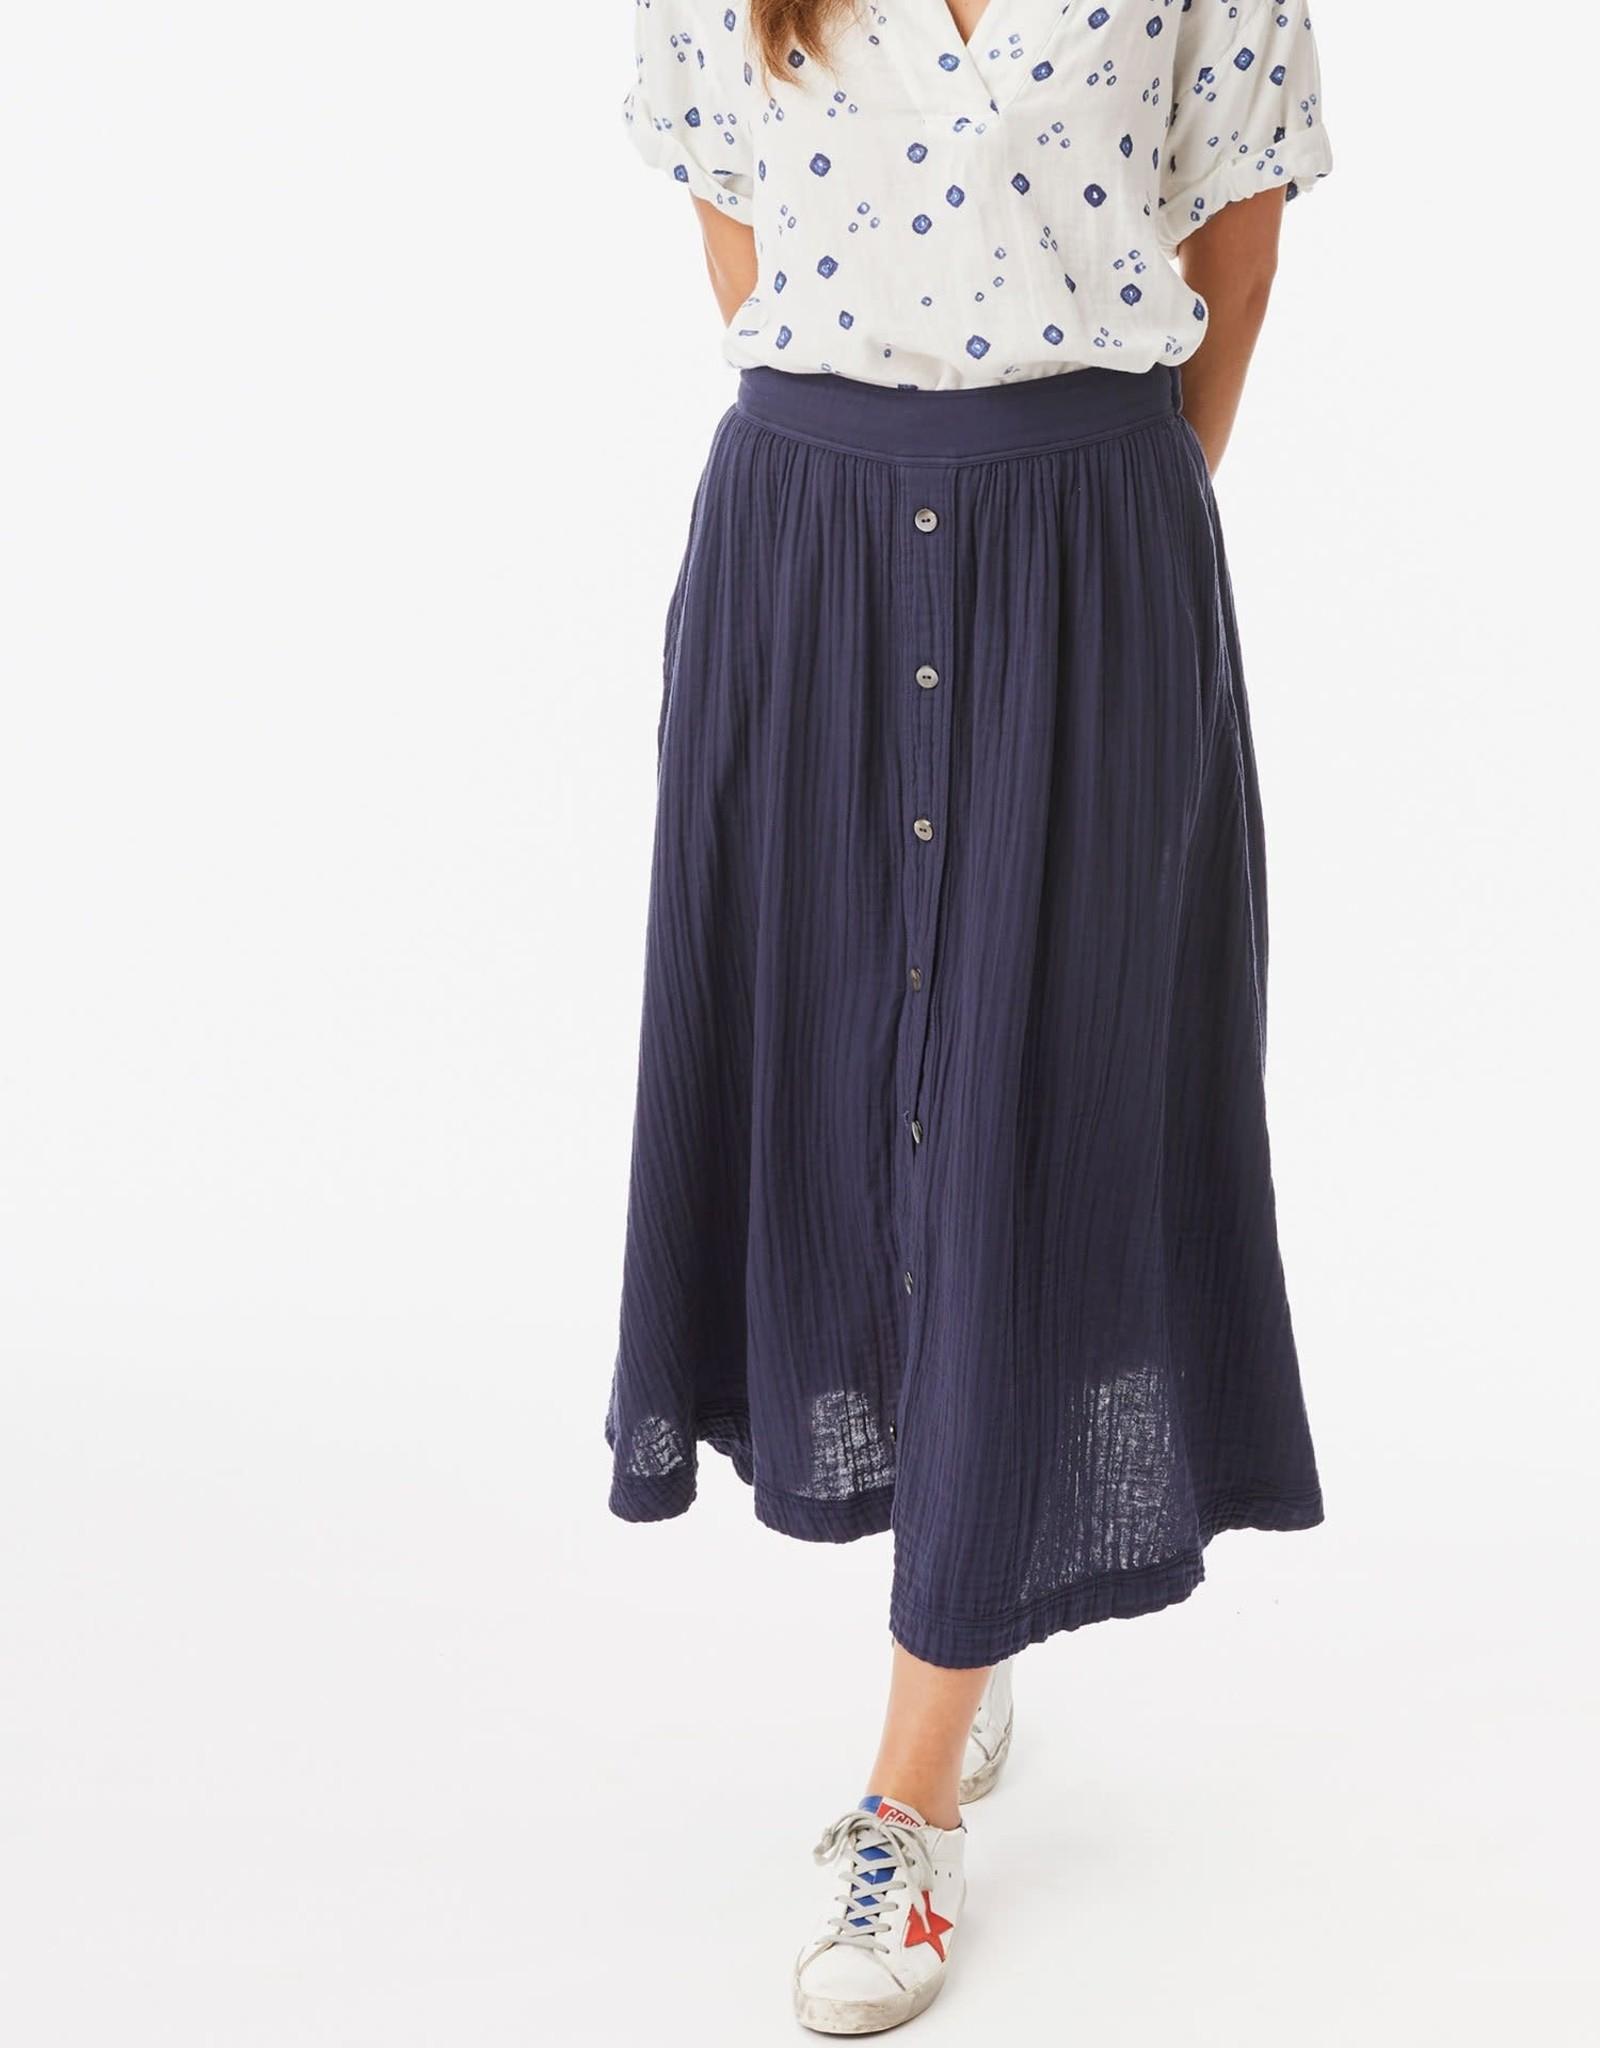 Xirena Teagan Skirt